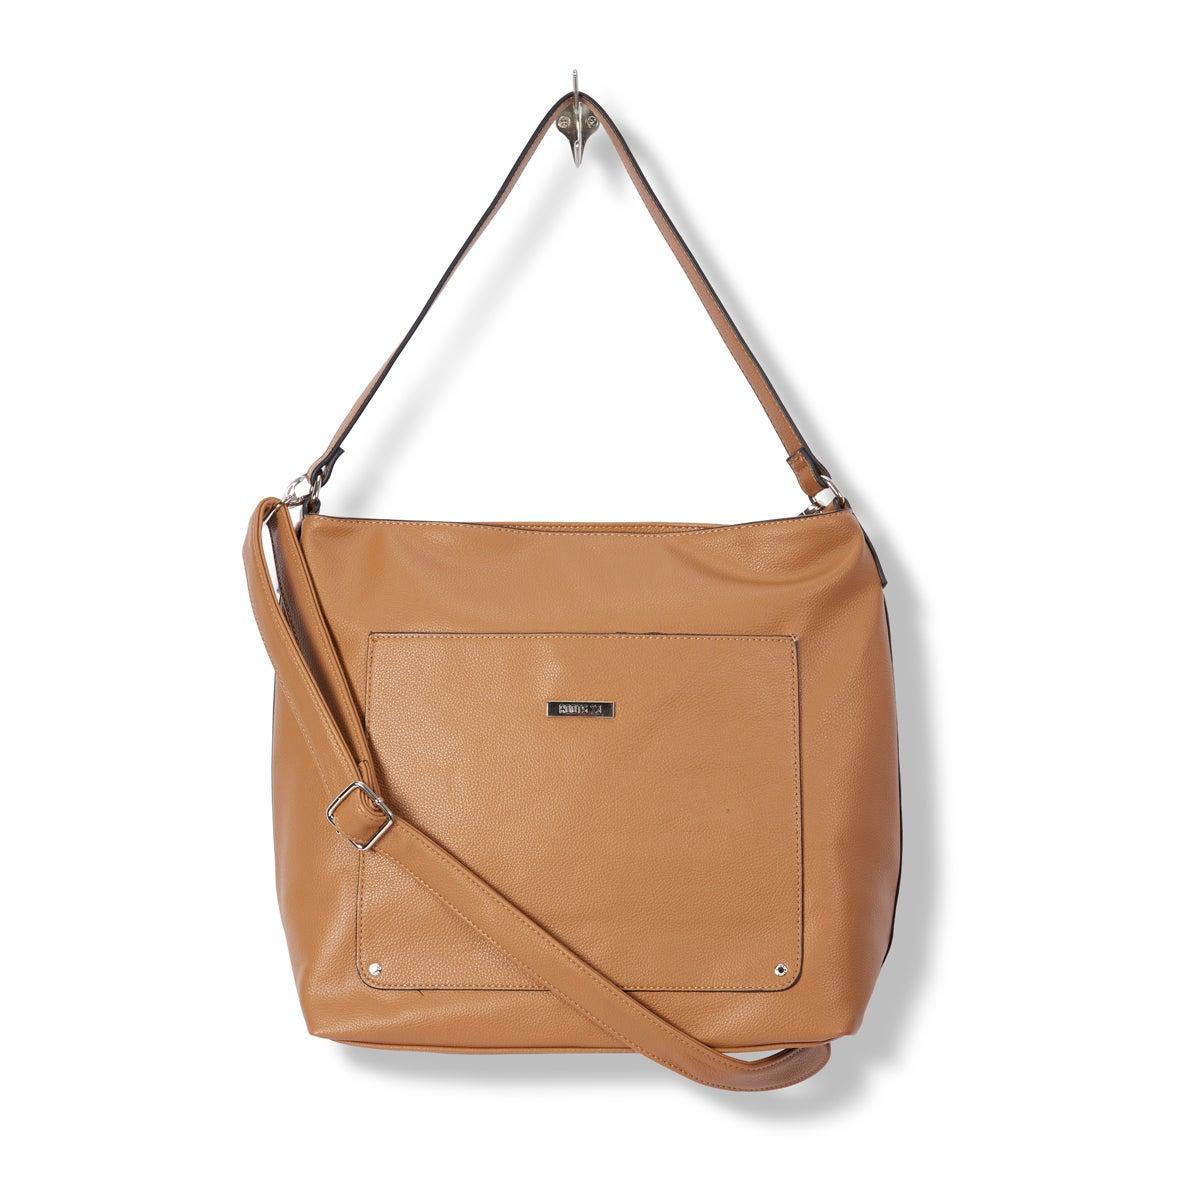 Lds Roots73 camel hobo handbag